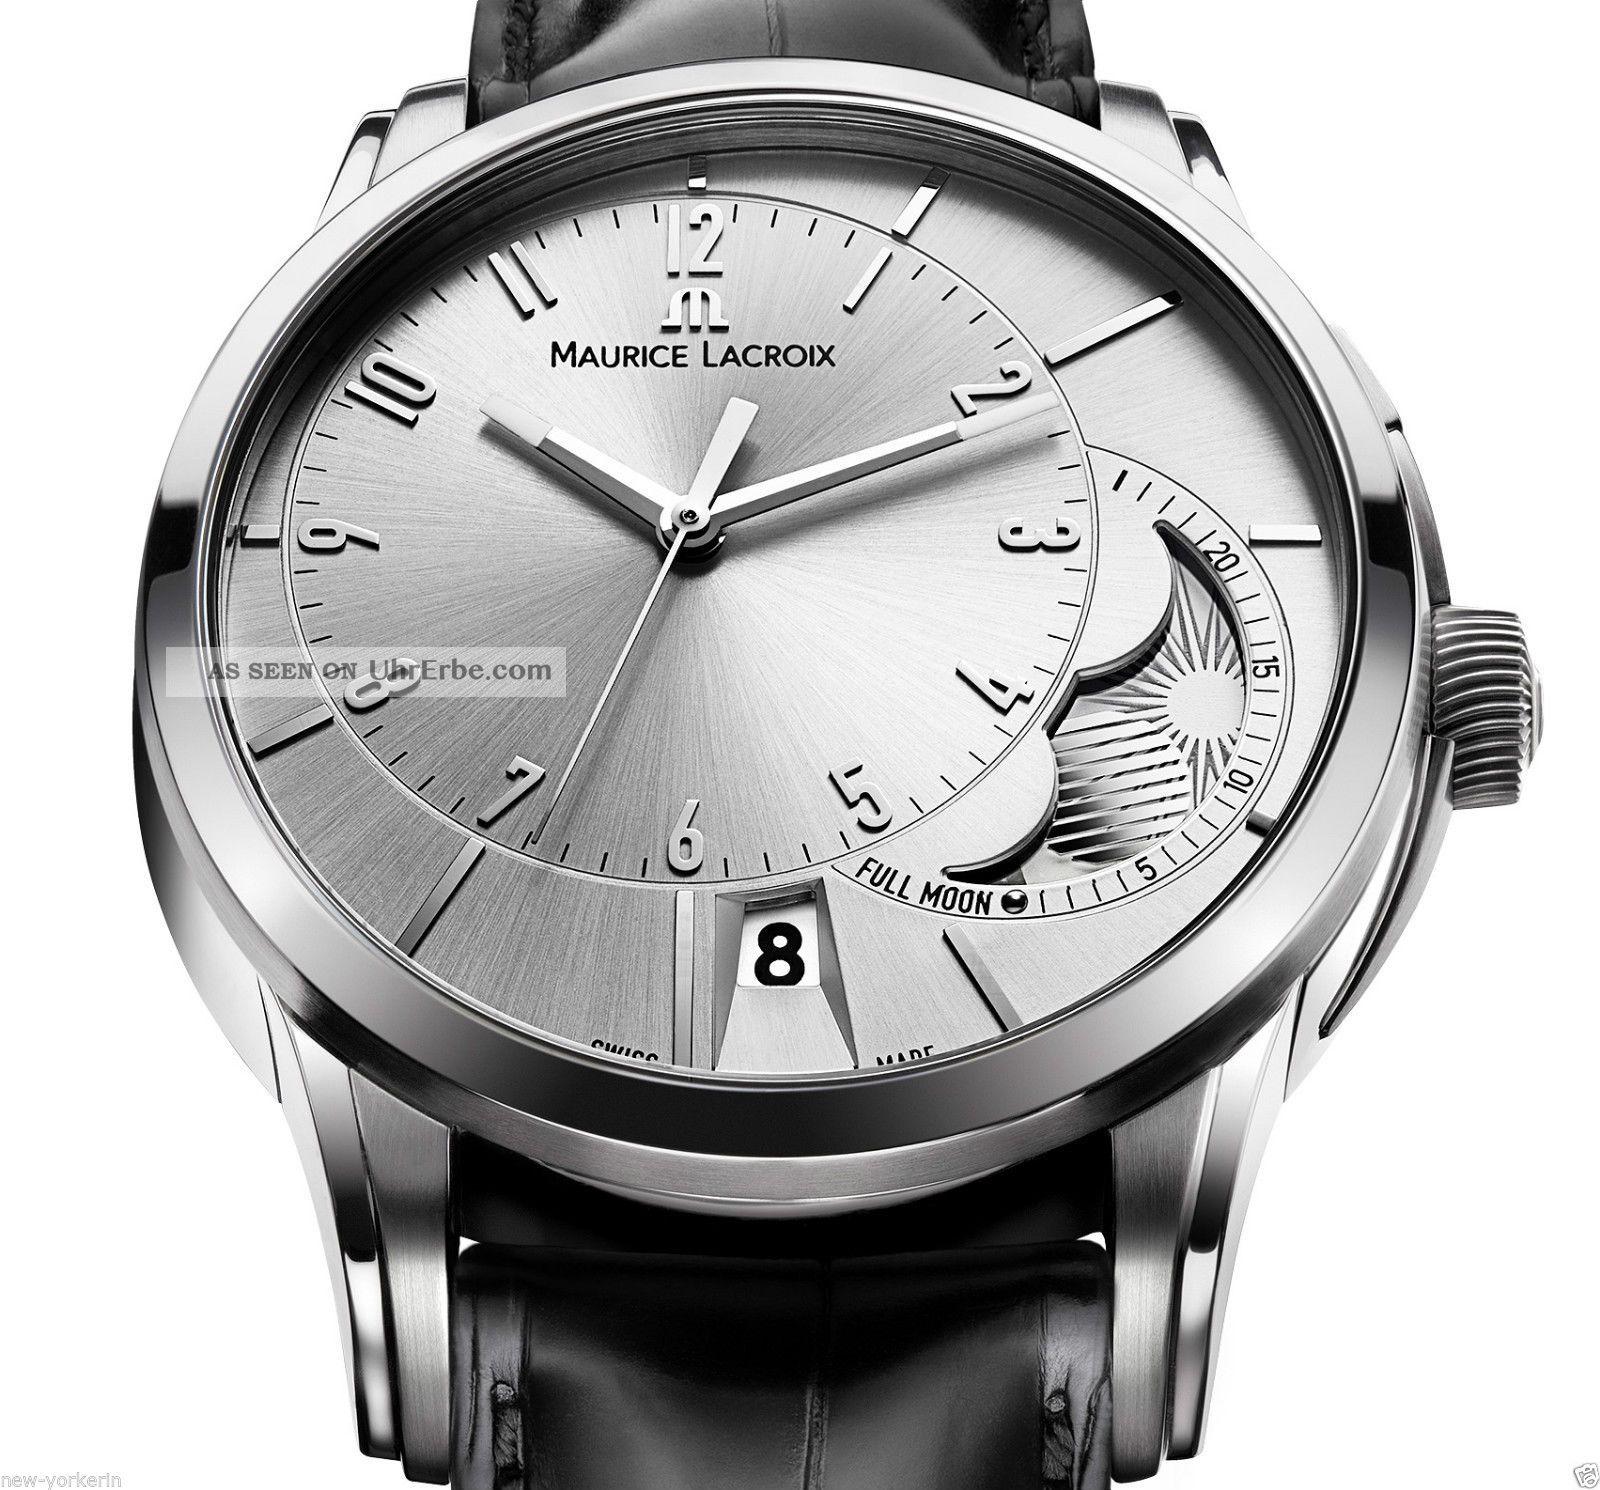 Maurice Lacroix Herrenuhr Pontos Decentrique Armbanduhren Bild